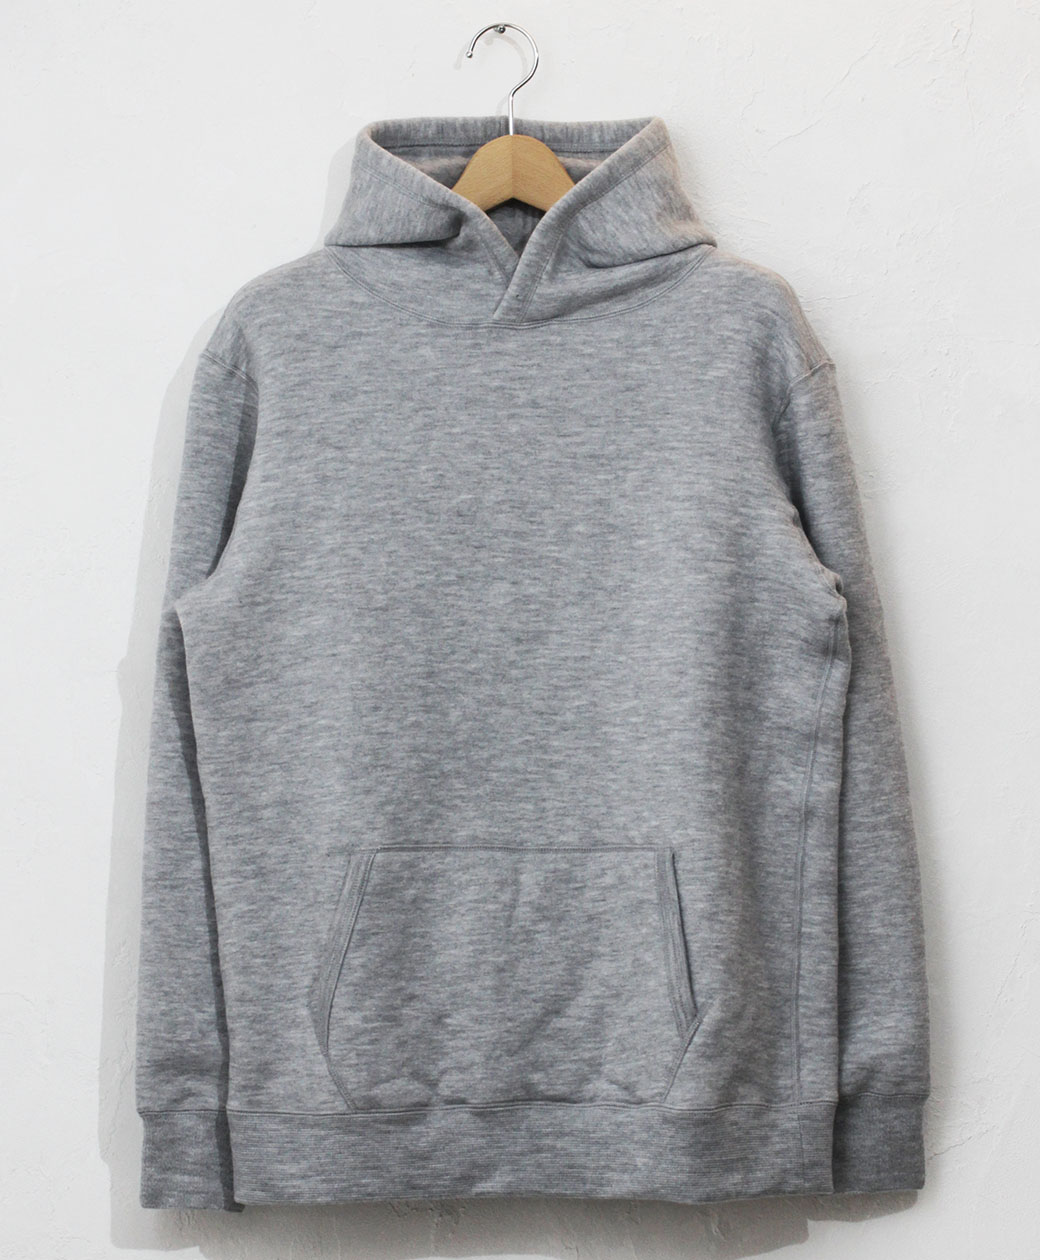 yetina pullover hoodie(heather gray)